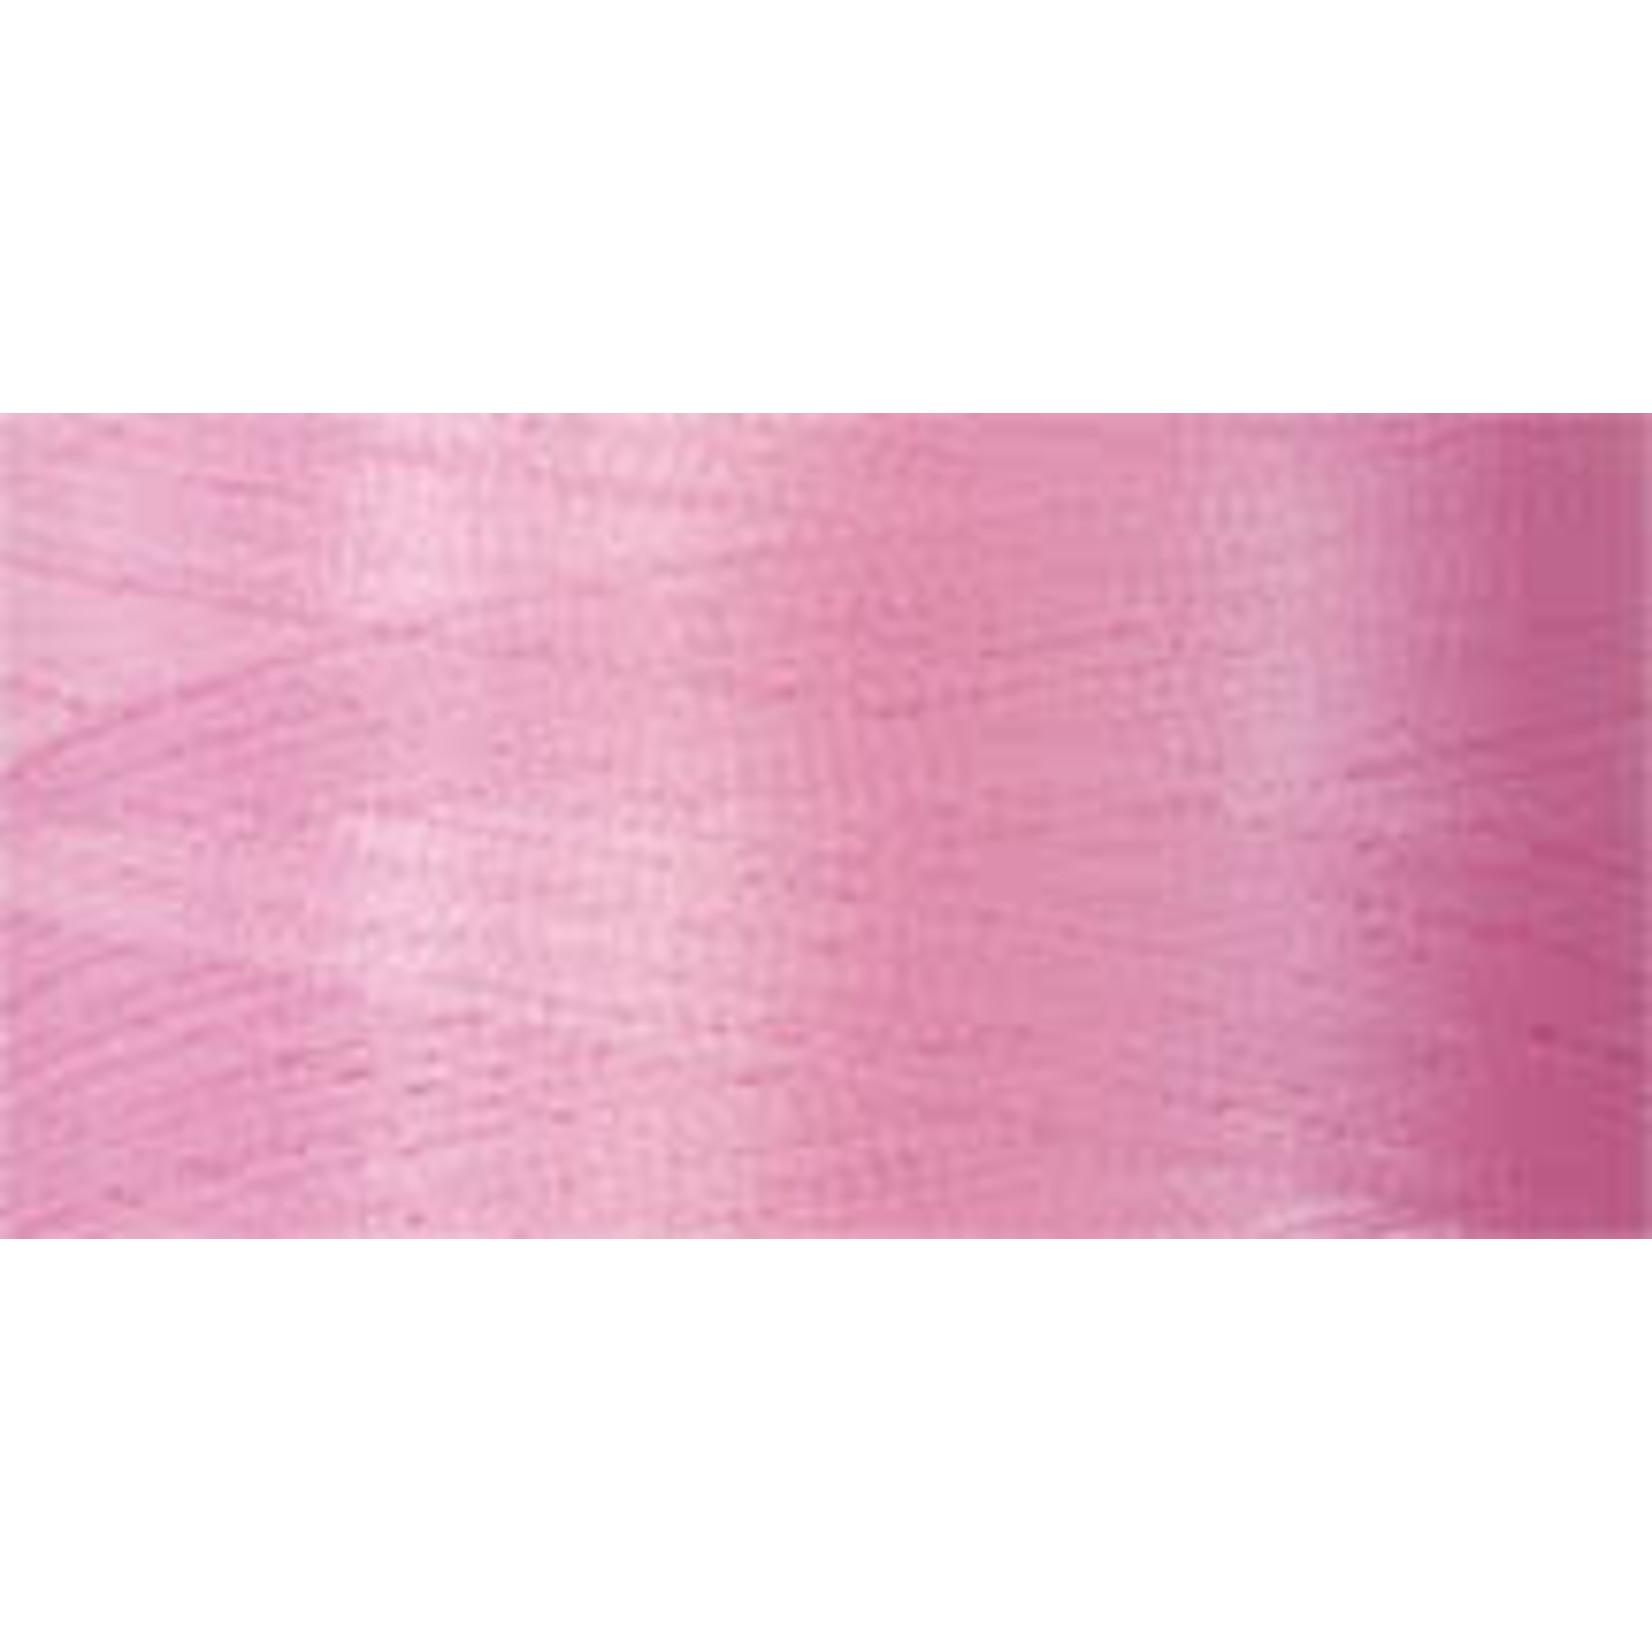 Superior Threads Bottom Line - #60 - 1300 m - 605 Light Pink